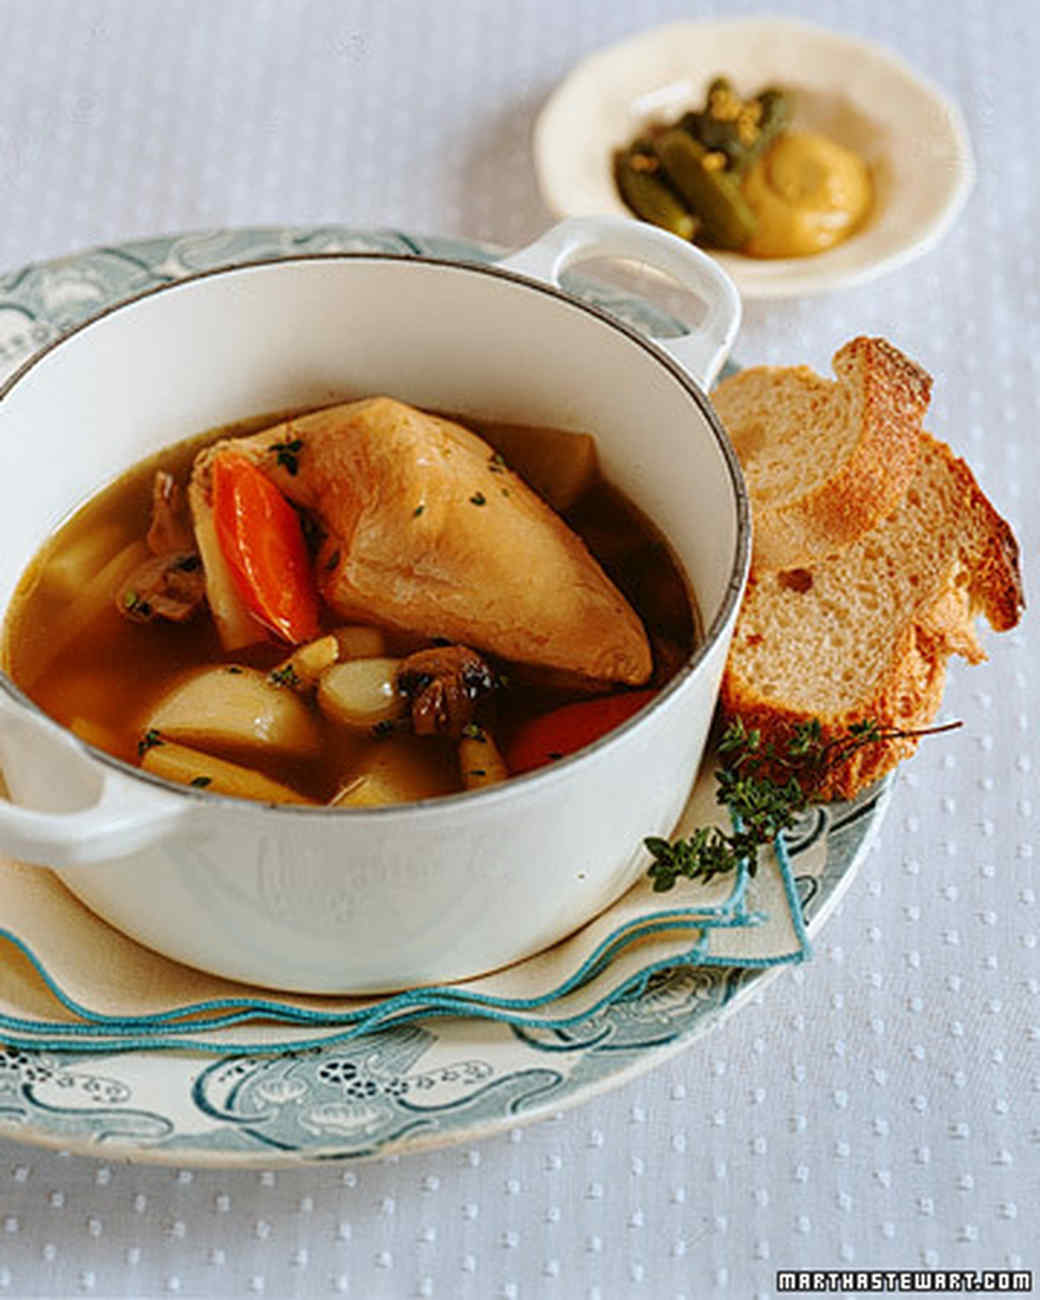 Poached Chicken and Vegetables (Poule au Pot)